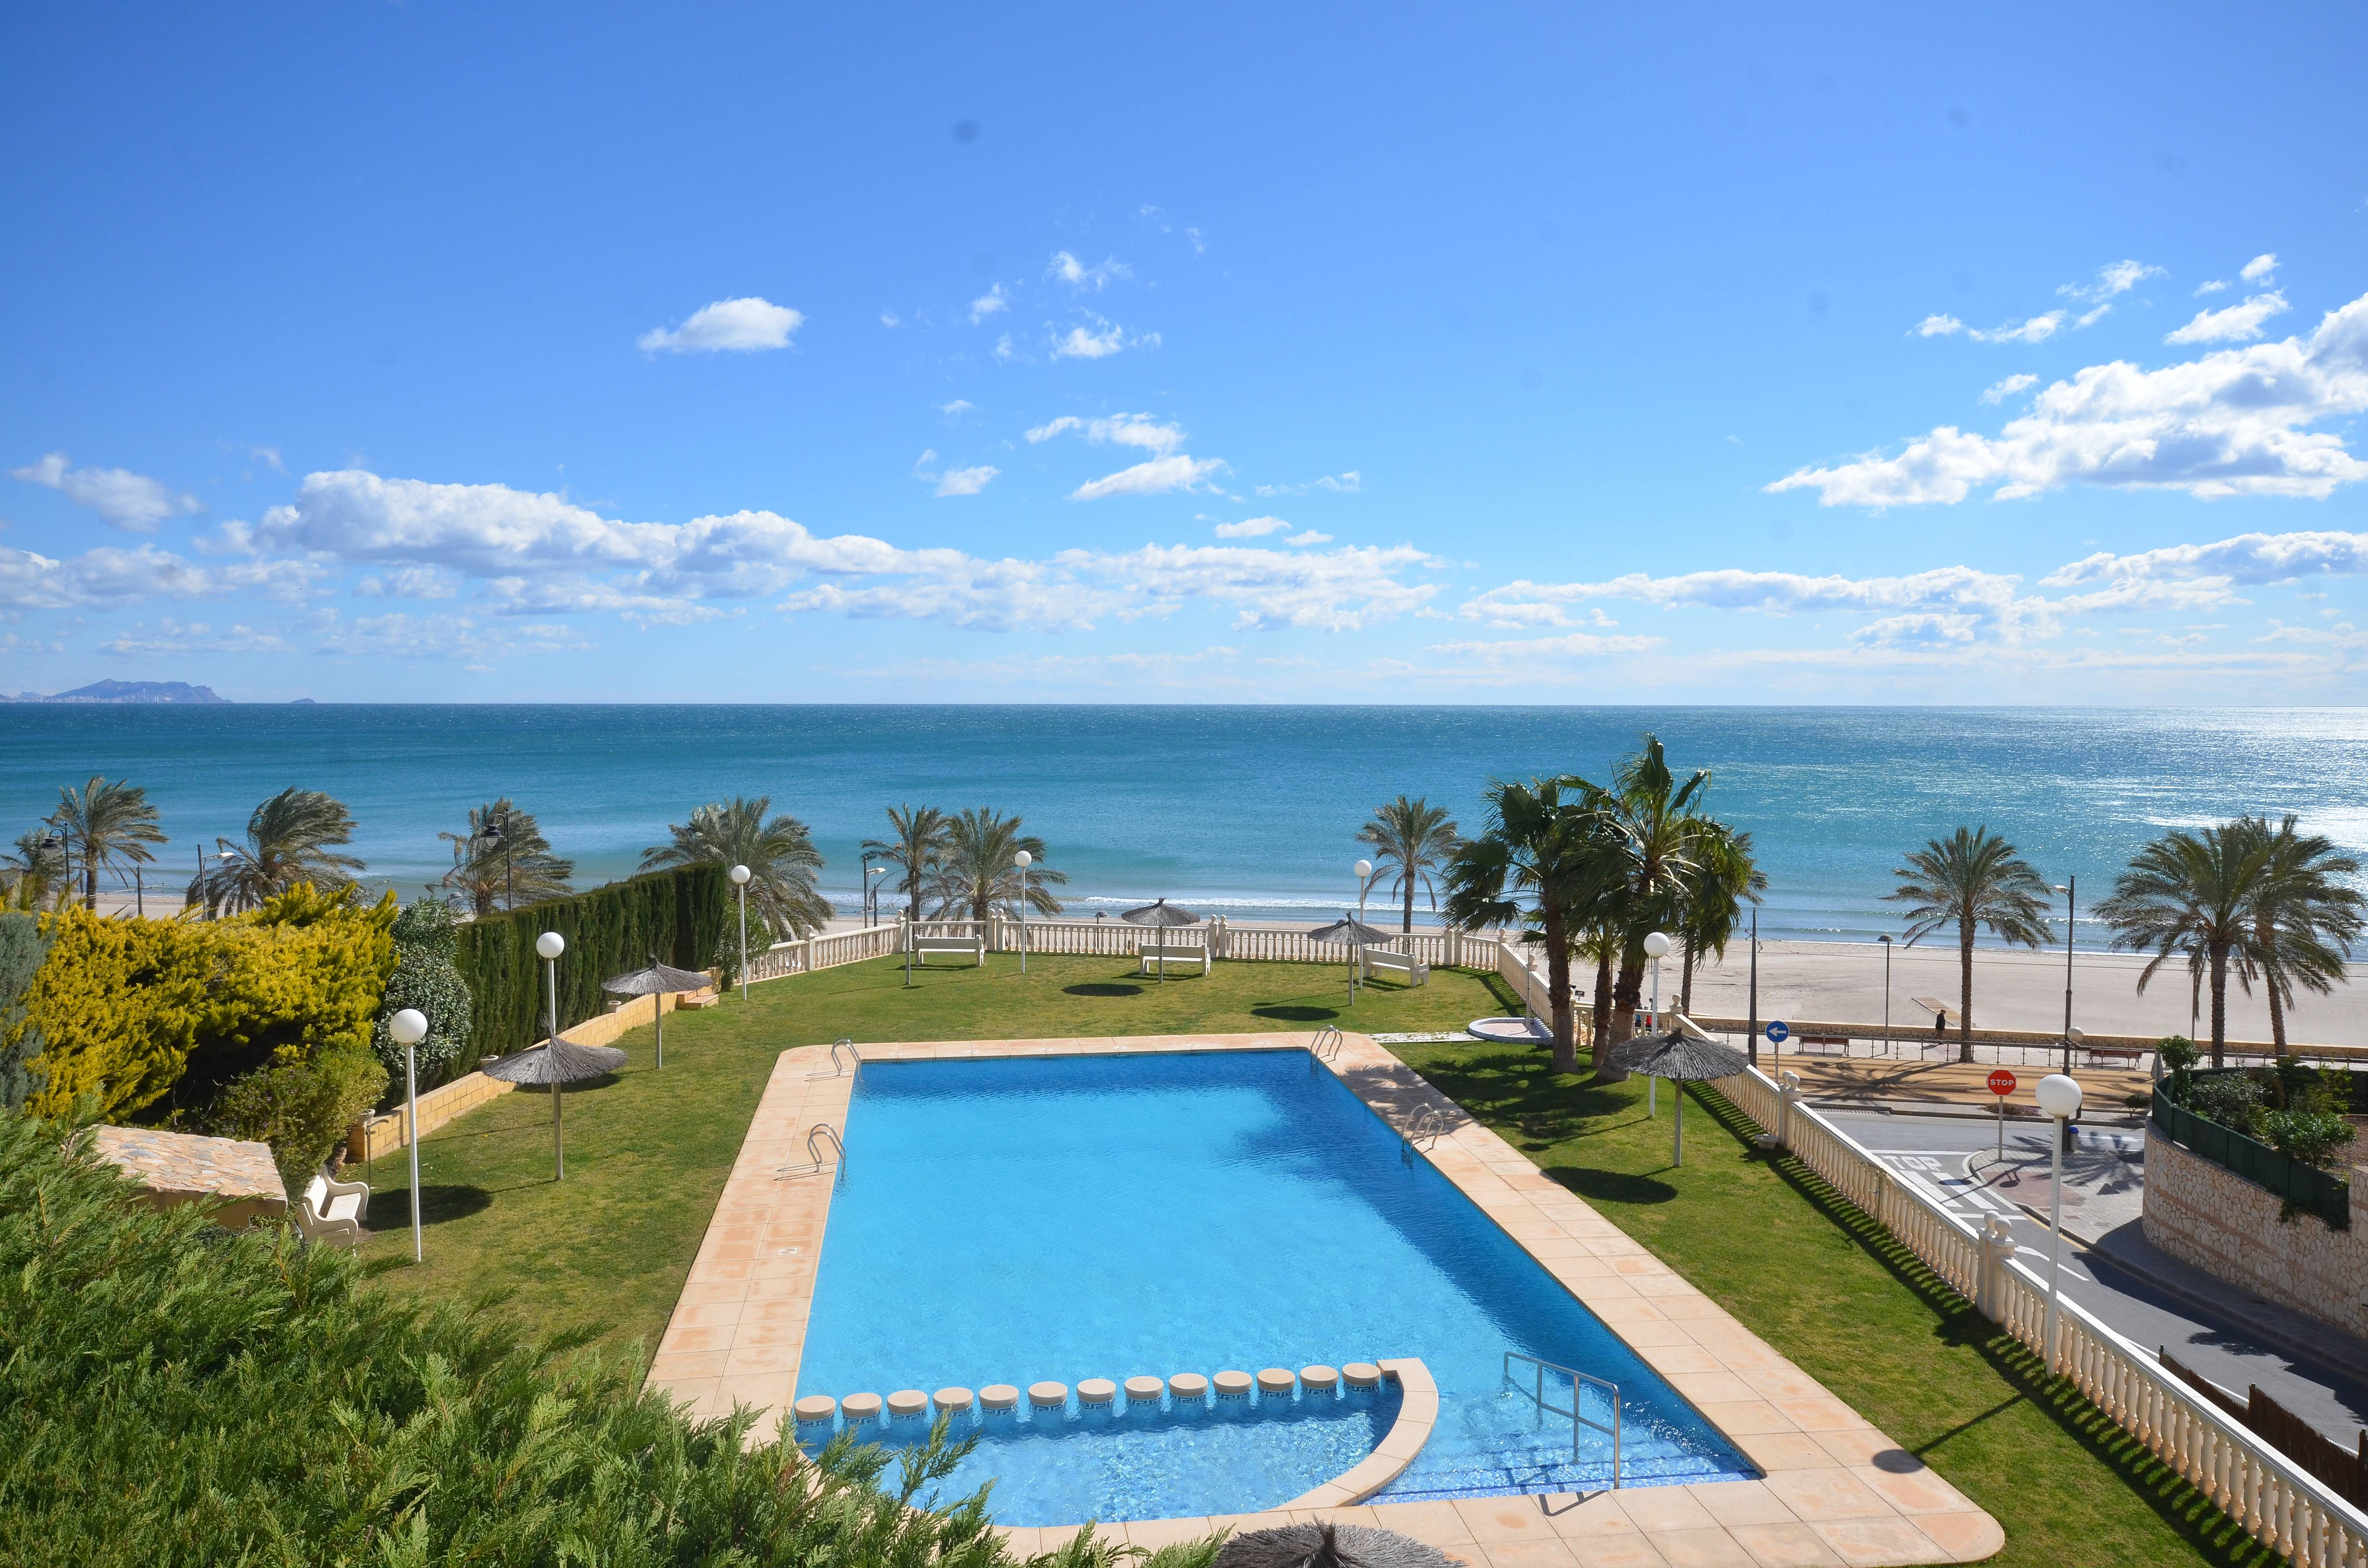 Urba europa 6 pers 50 m de la playa aa wifi playa for Piscina publica malaga